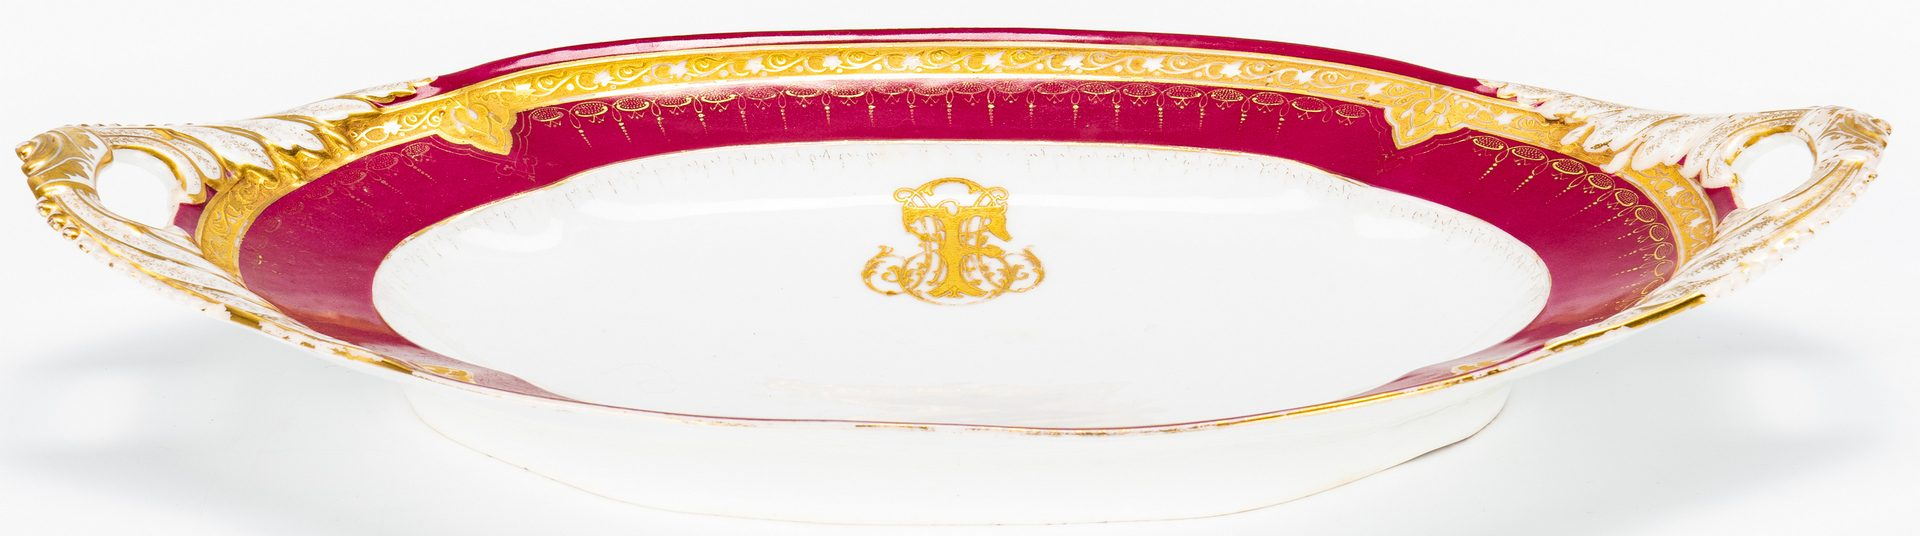 Lot 326: 4 French Ceramic Items, incl. Honore Savy, Guerin, Haviland